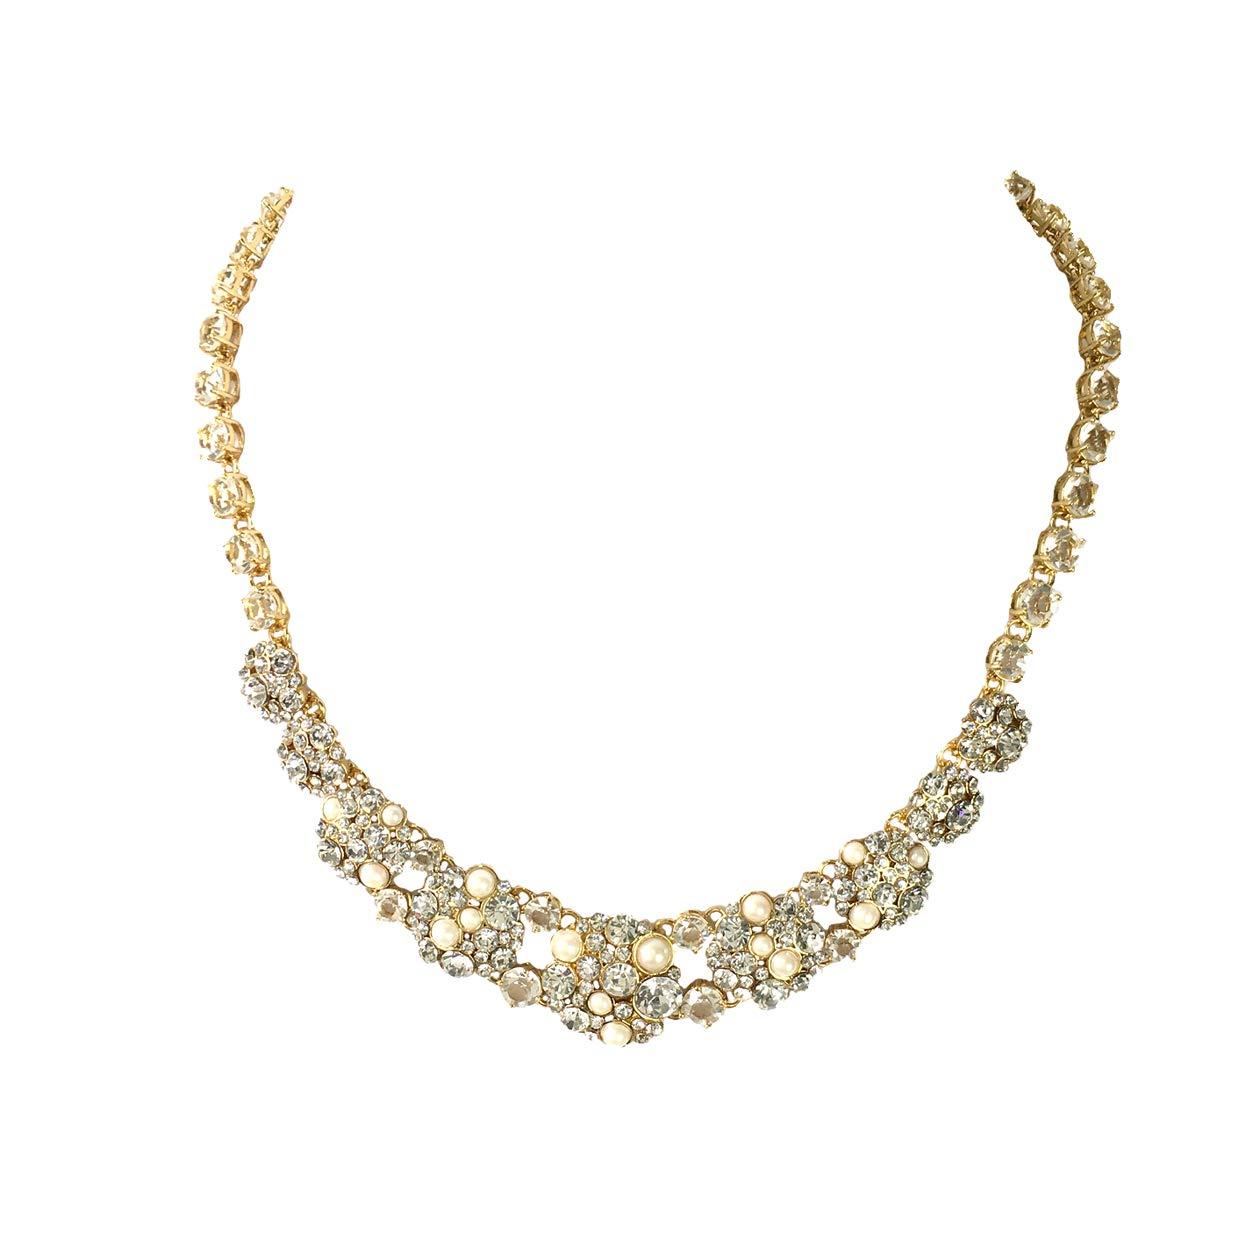 Kate Spade 'Pick A Pearl' Simulated Pearl Graduated Necklace, Cream Multi